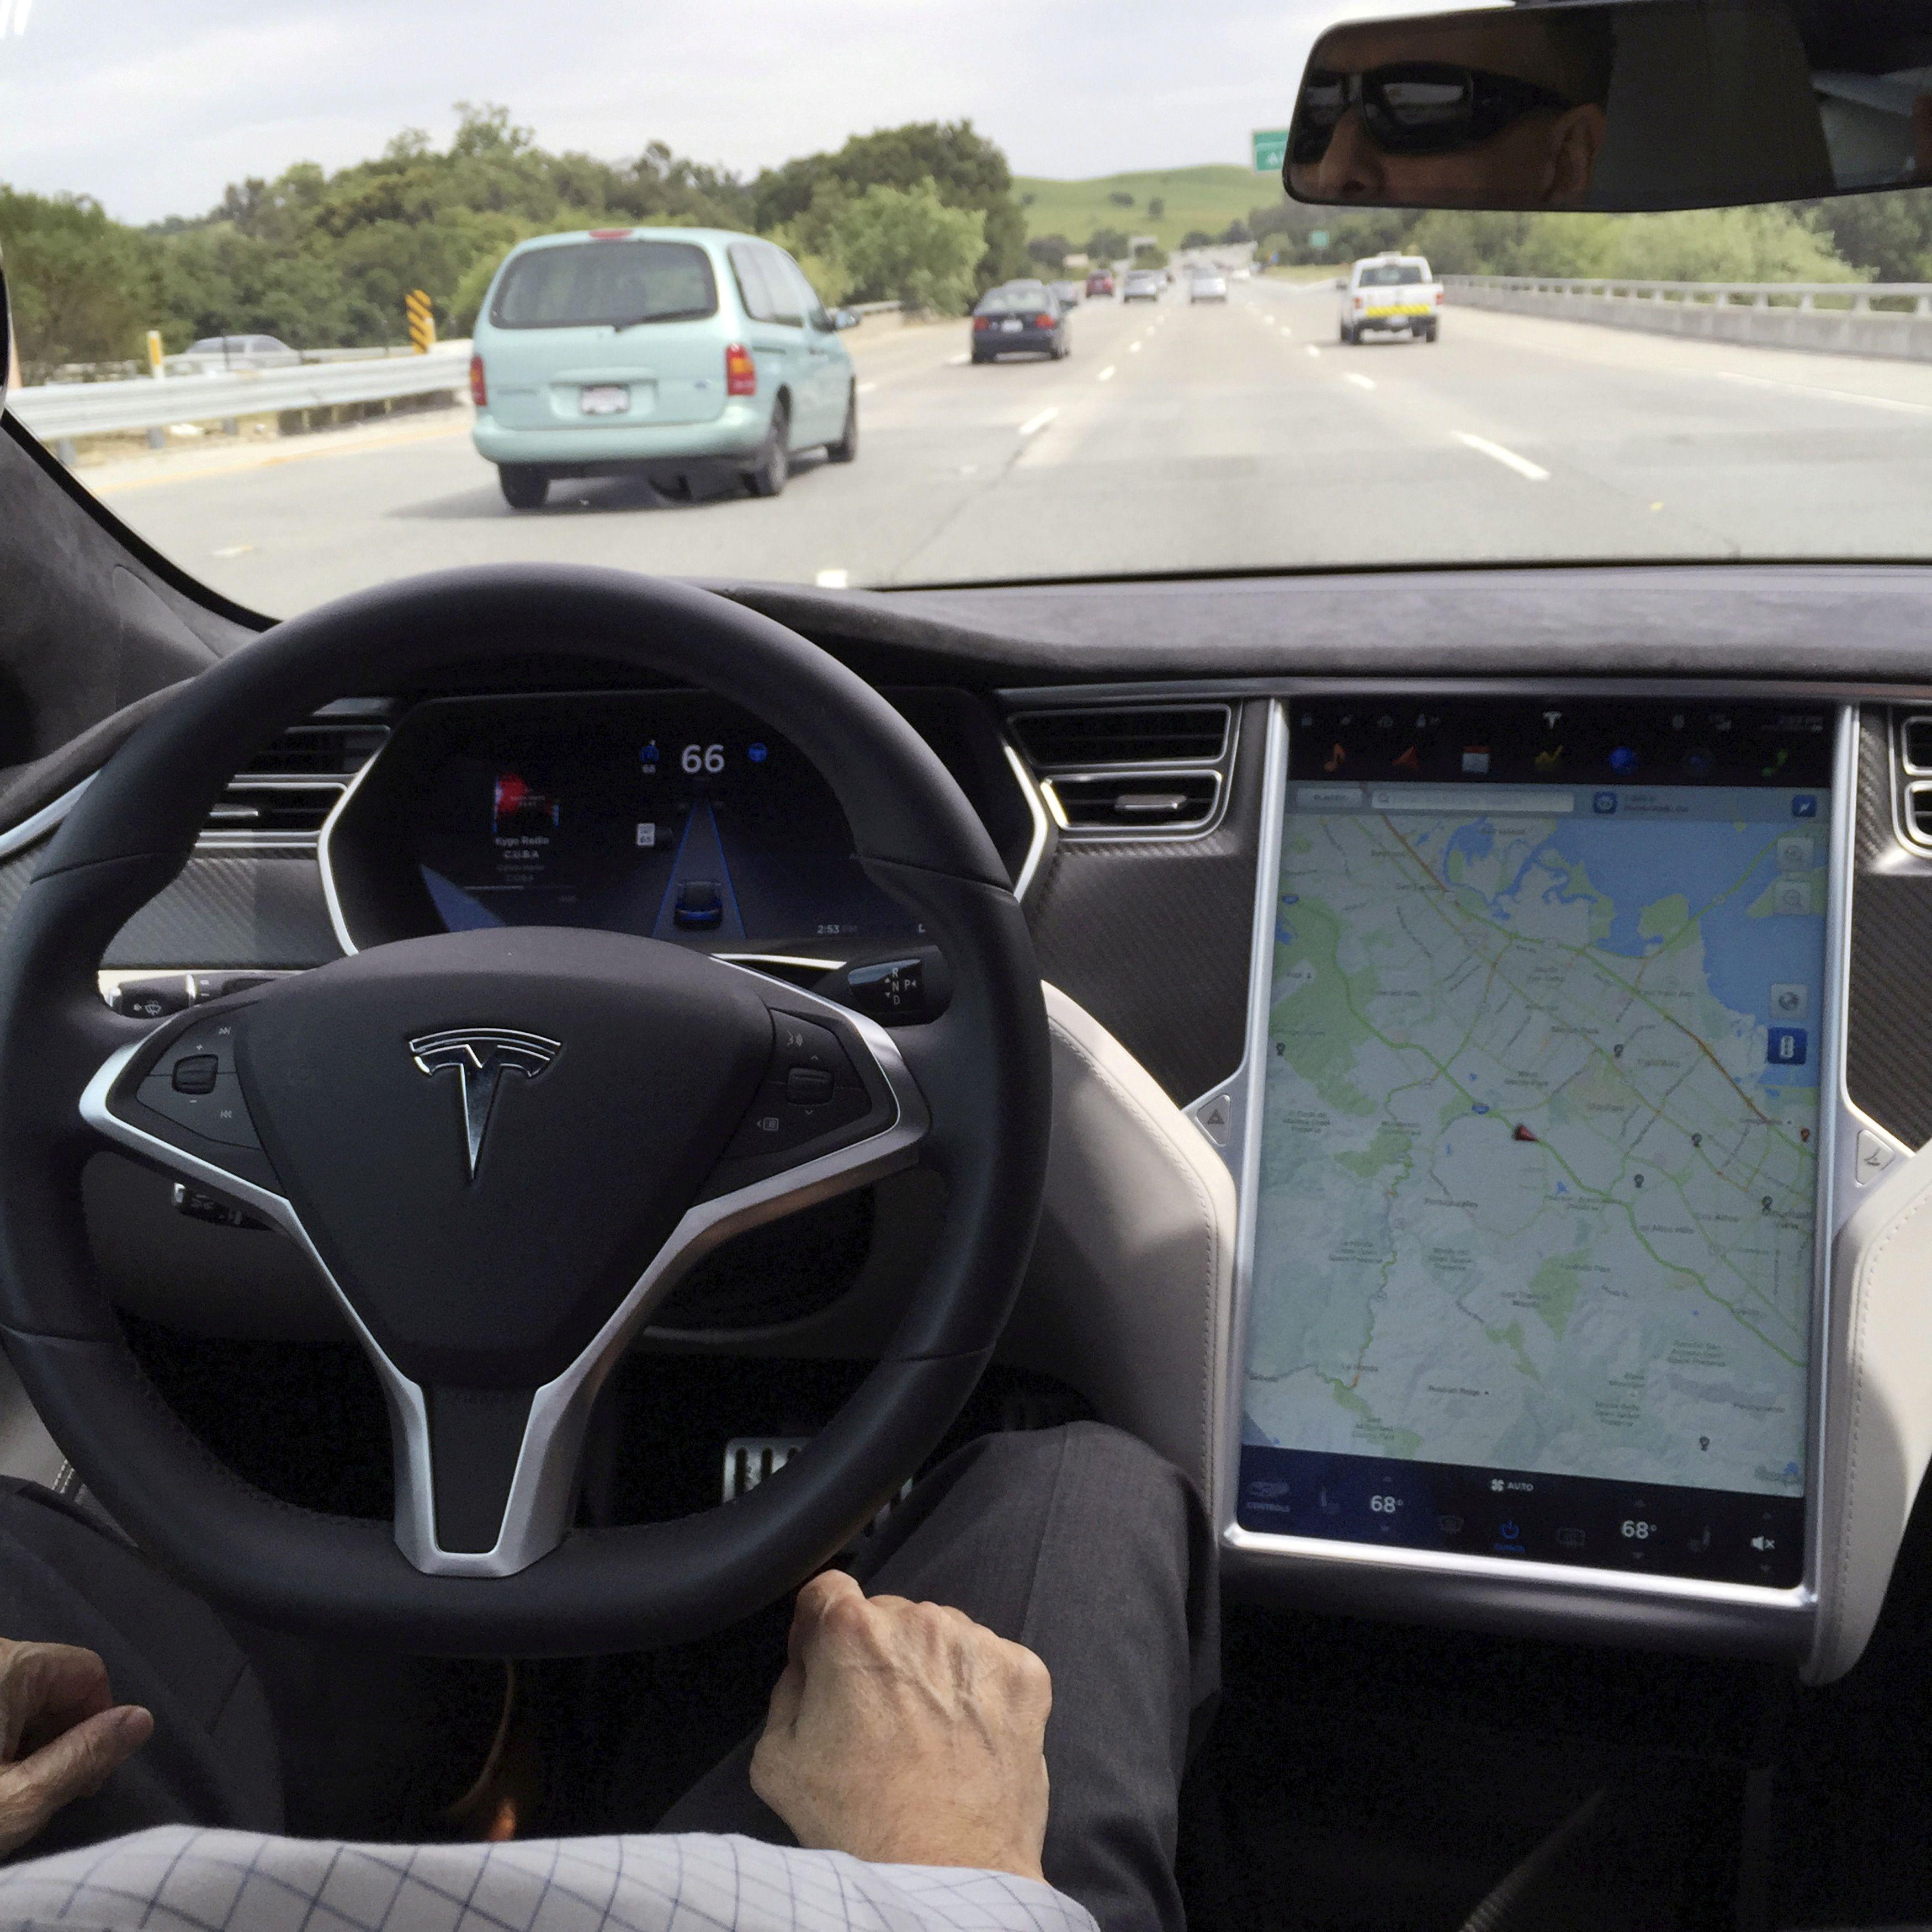 Explainer: Tesla drops radar; is Autopilot system safe?